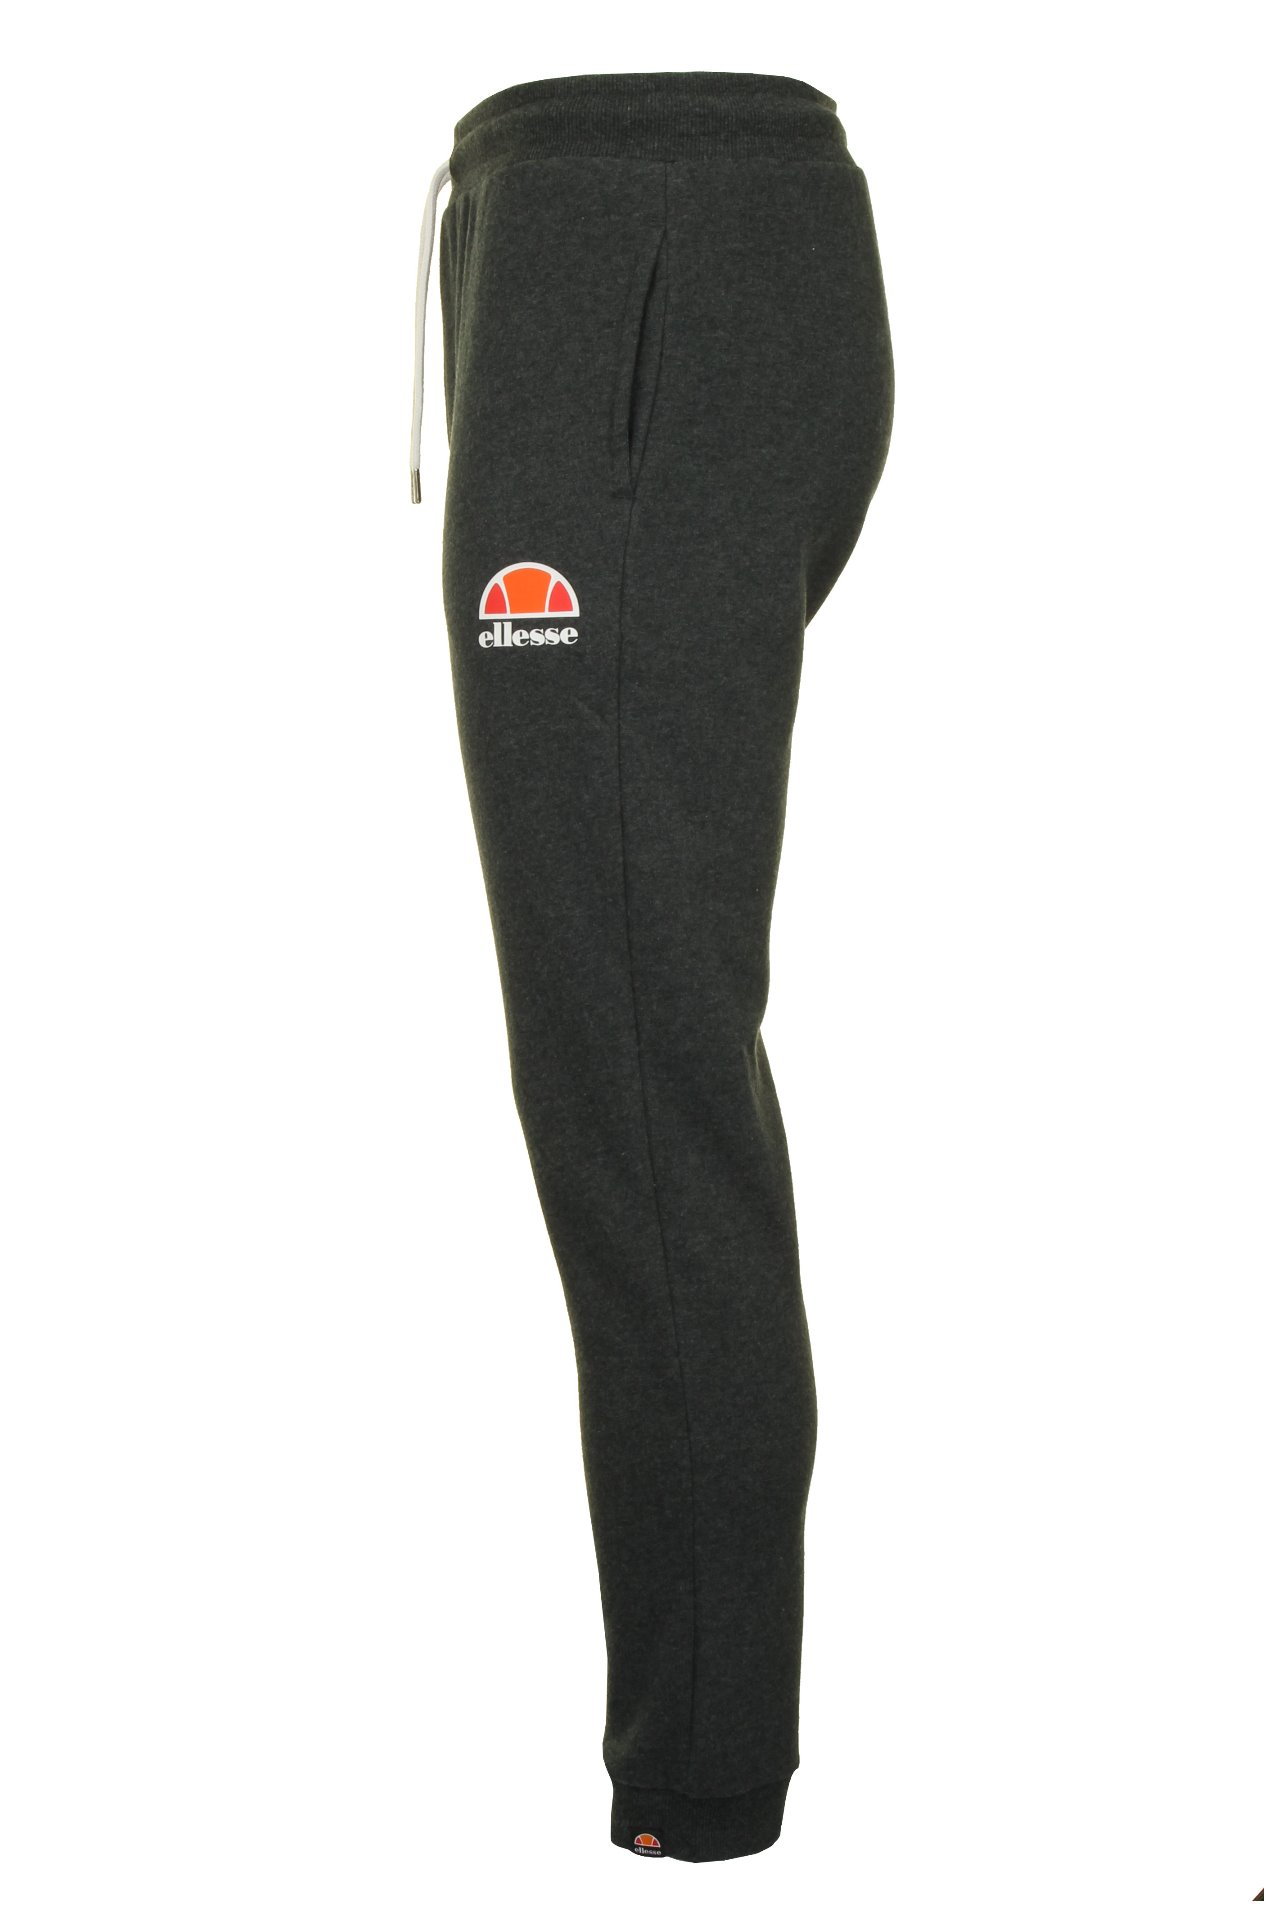 Ellesse-Da-Uomo-Pantaloni-Sportivi-Jog-Pantaloni-con-logo-034-Ovest-034 miniatura 7